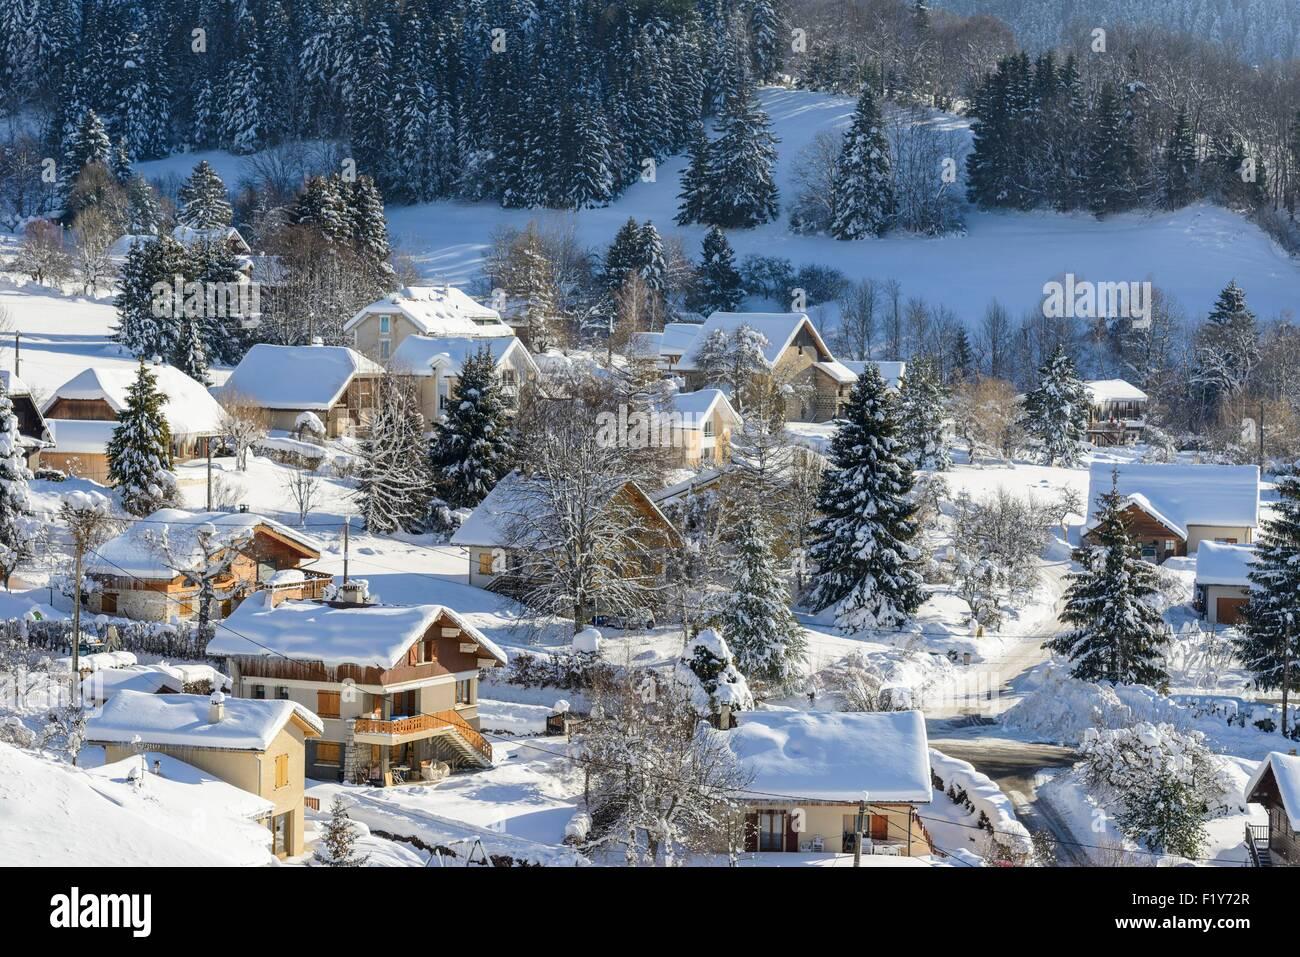 France, Isere, Chartreuse Regional Park, Le Sappey-en-Chartreuse - Stock Image